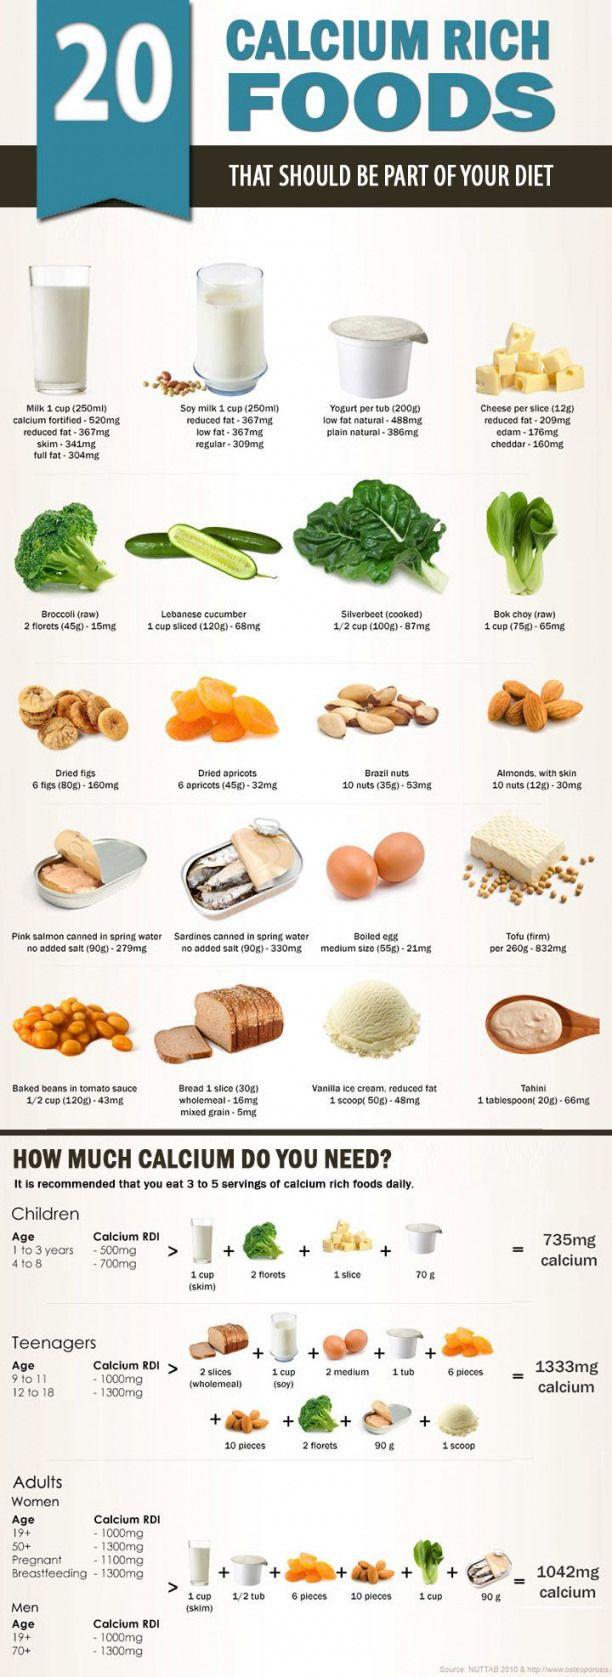 Pin by Stephanie Browning on Herbal tea remedies Calcium